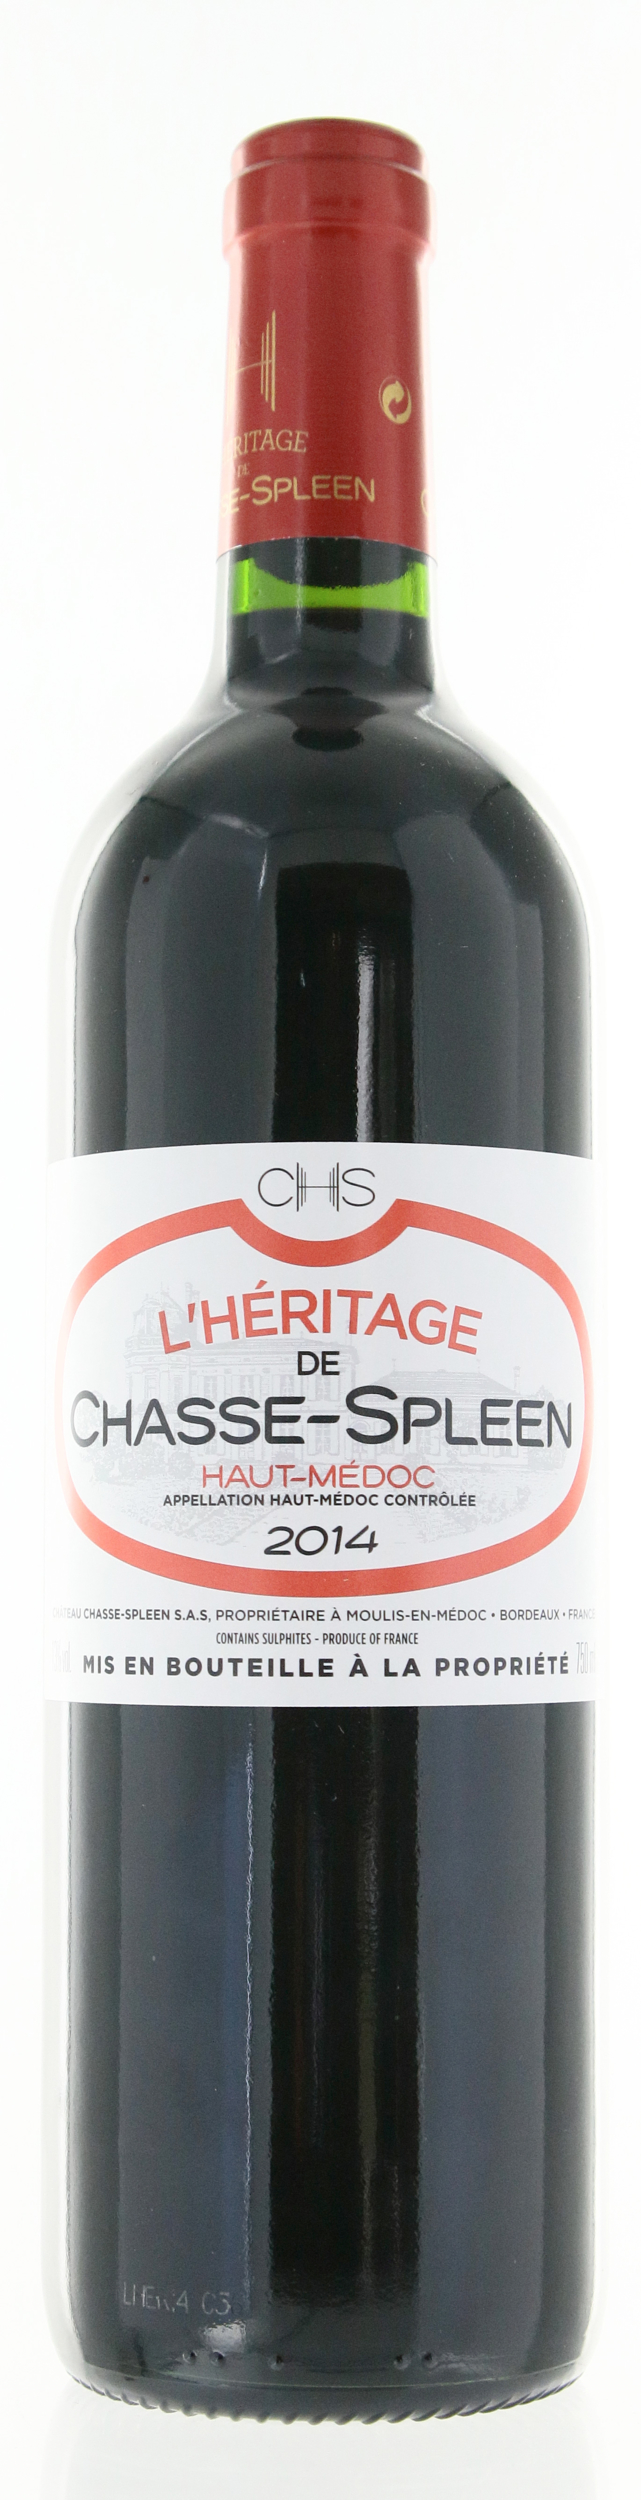 Haut Medoc - L\'Héritage de Chasse-Spleen - 2014